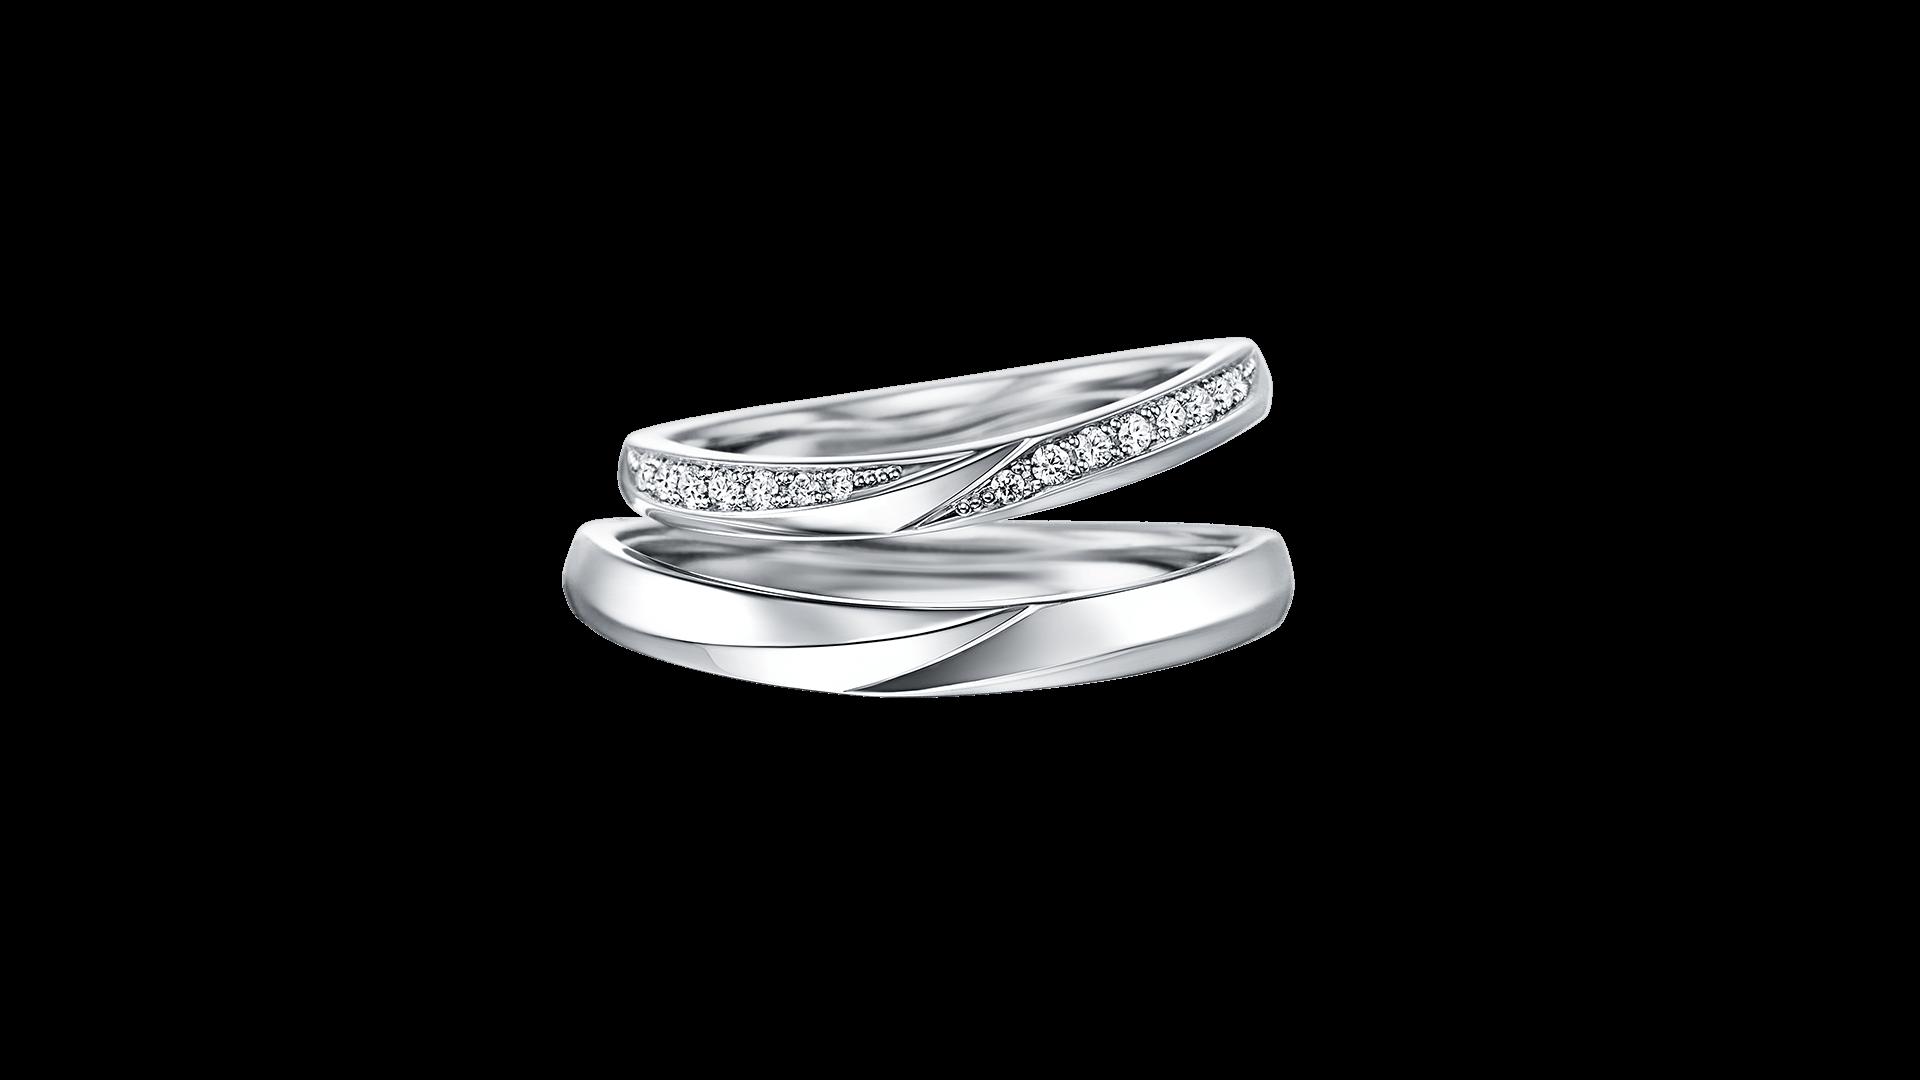 artemisia アルテミシア | 結婚指輪サムネイル 2